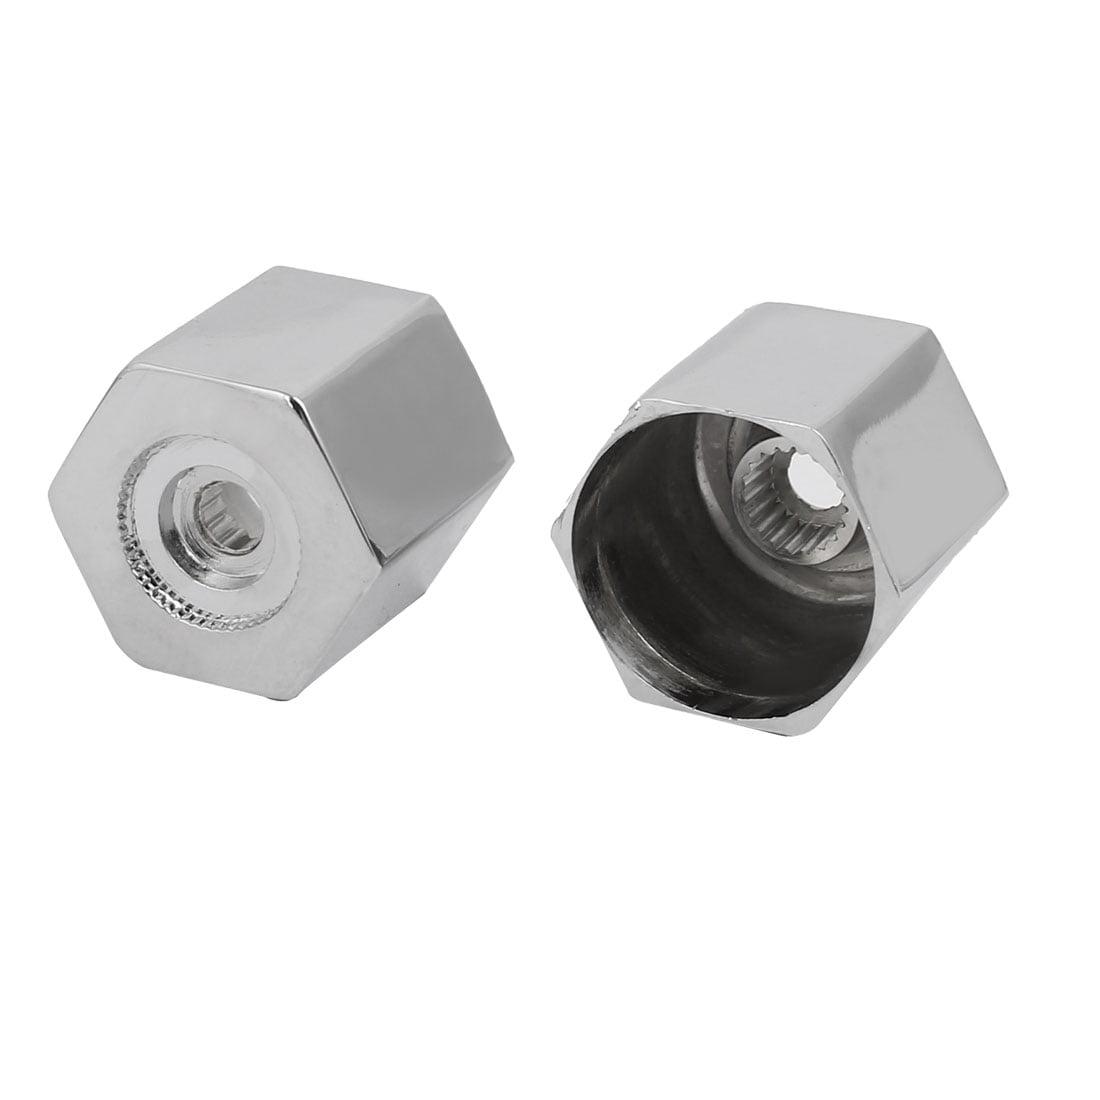 7 Colors LED Light Water Glow Faucet Tap Faucet Diverter Valve Adapter WM